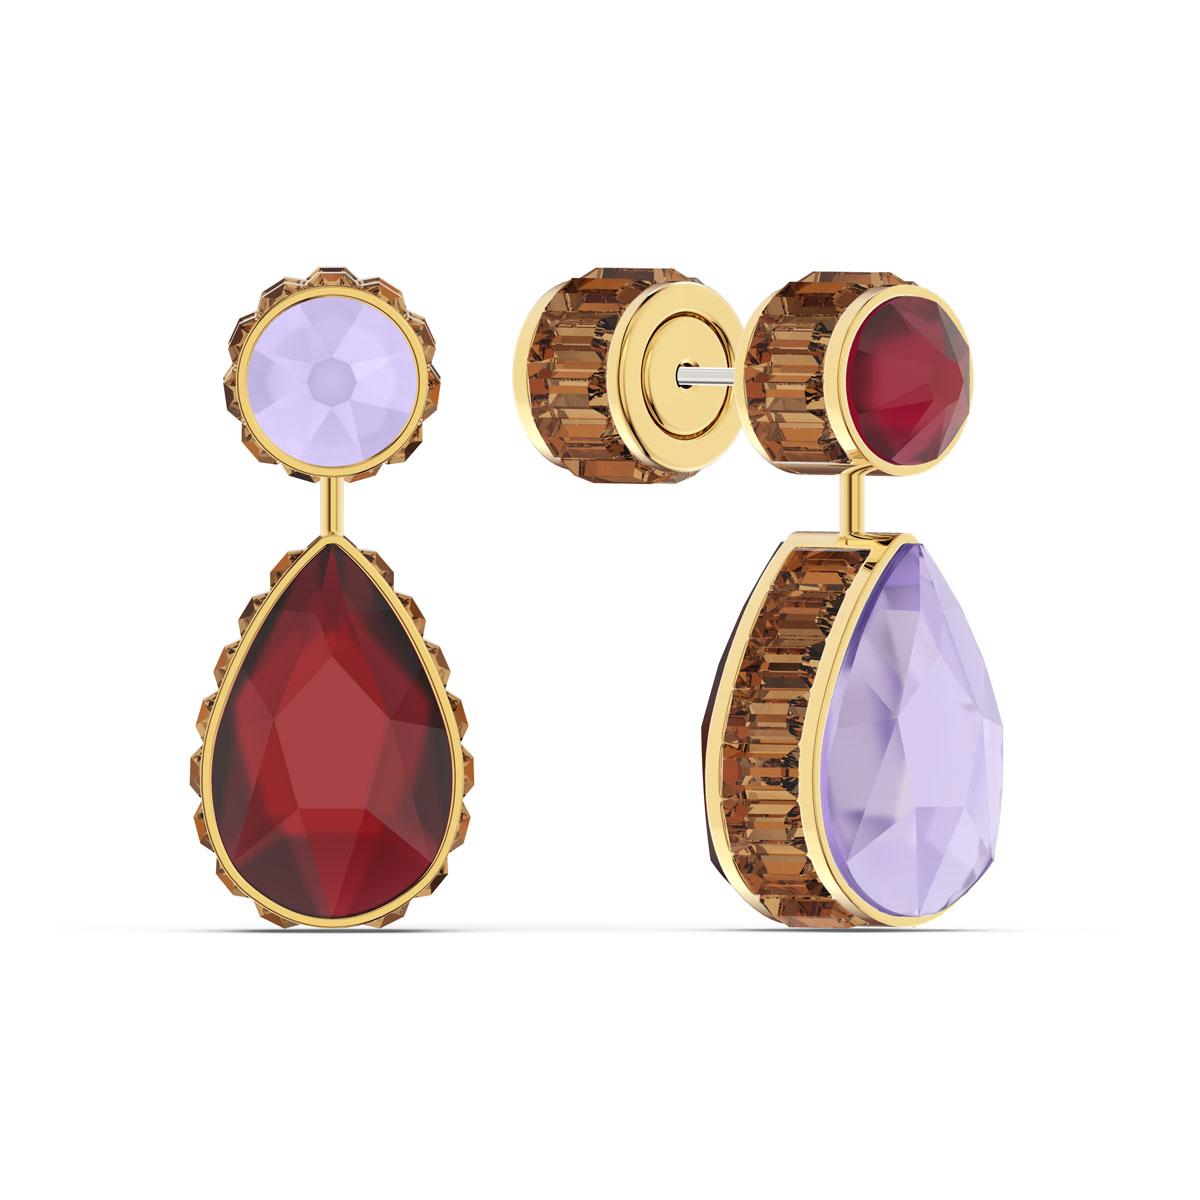 Swarovski Orbita Earrings Asymmetrical, Drop Cut Crystals, Multicolored, Gold-Tone Plated, Set